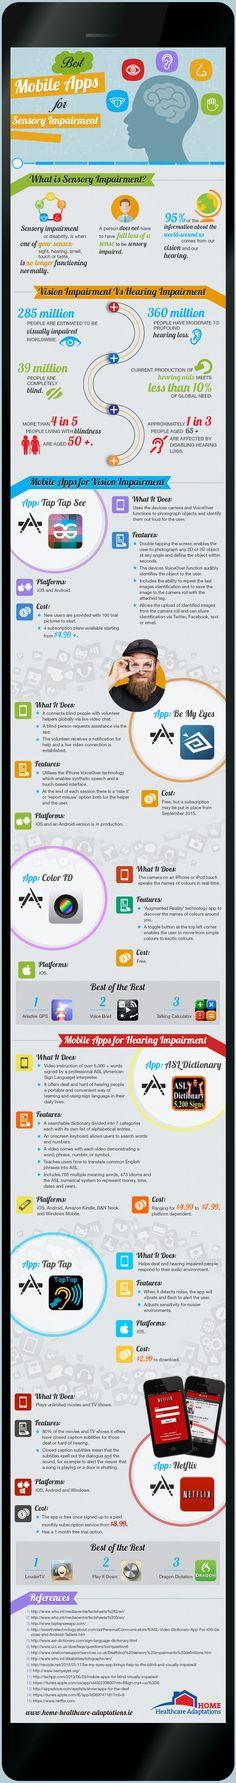 Best Mobile Apps for Sensory Impairment Infographic - http://elearninginfographics.com/best-mobile-apps-sensory-impairment-infographic/